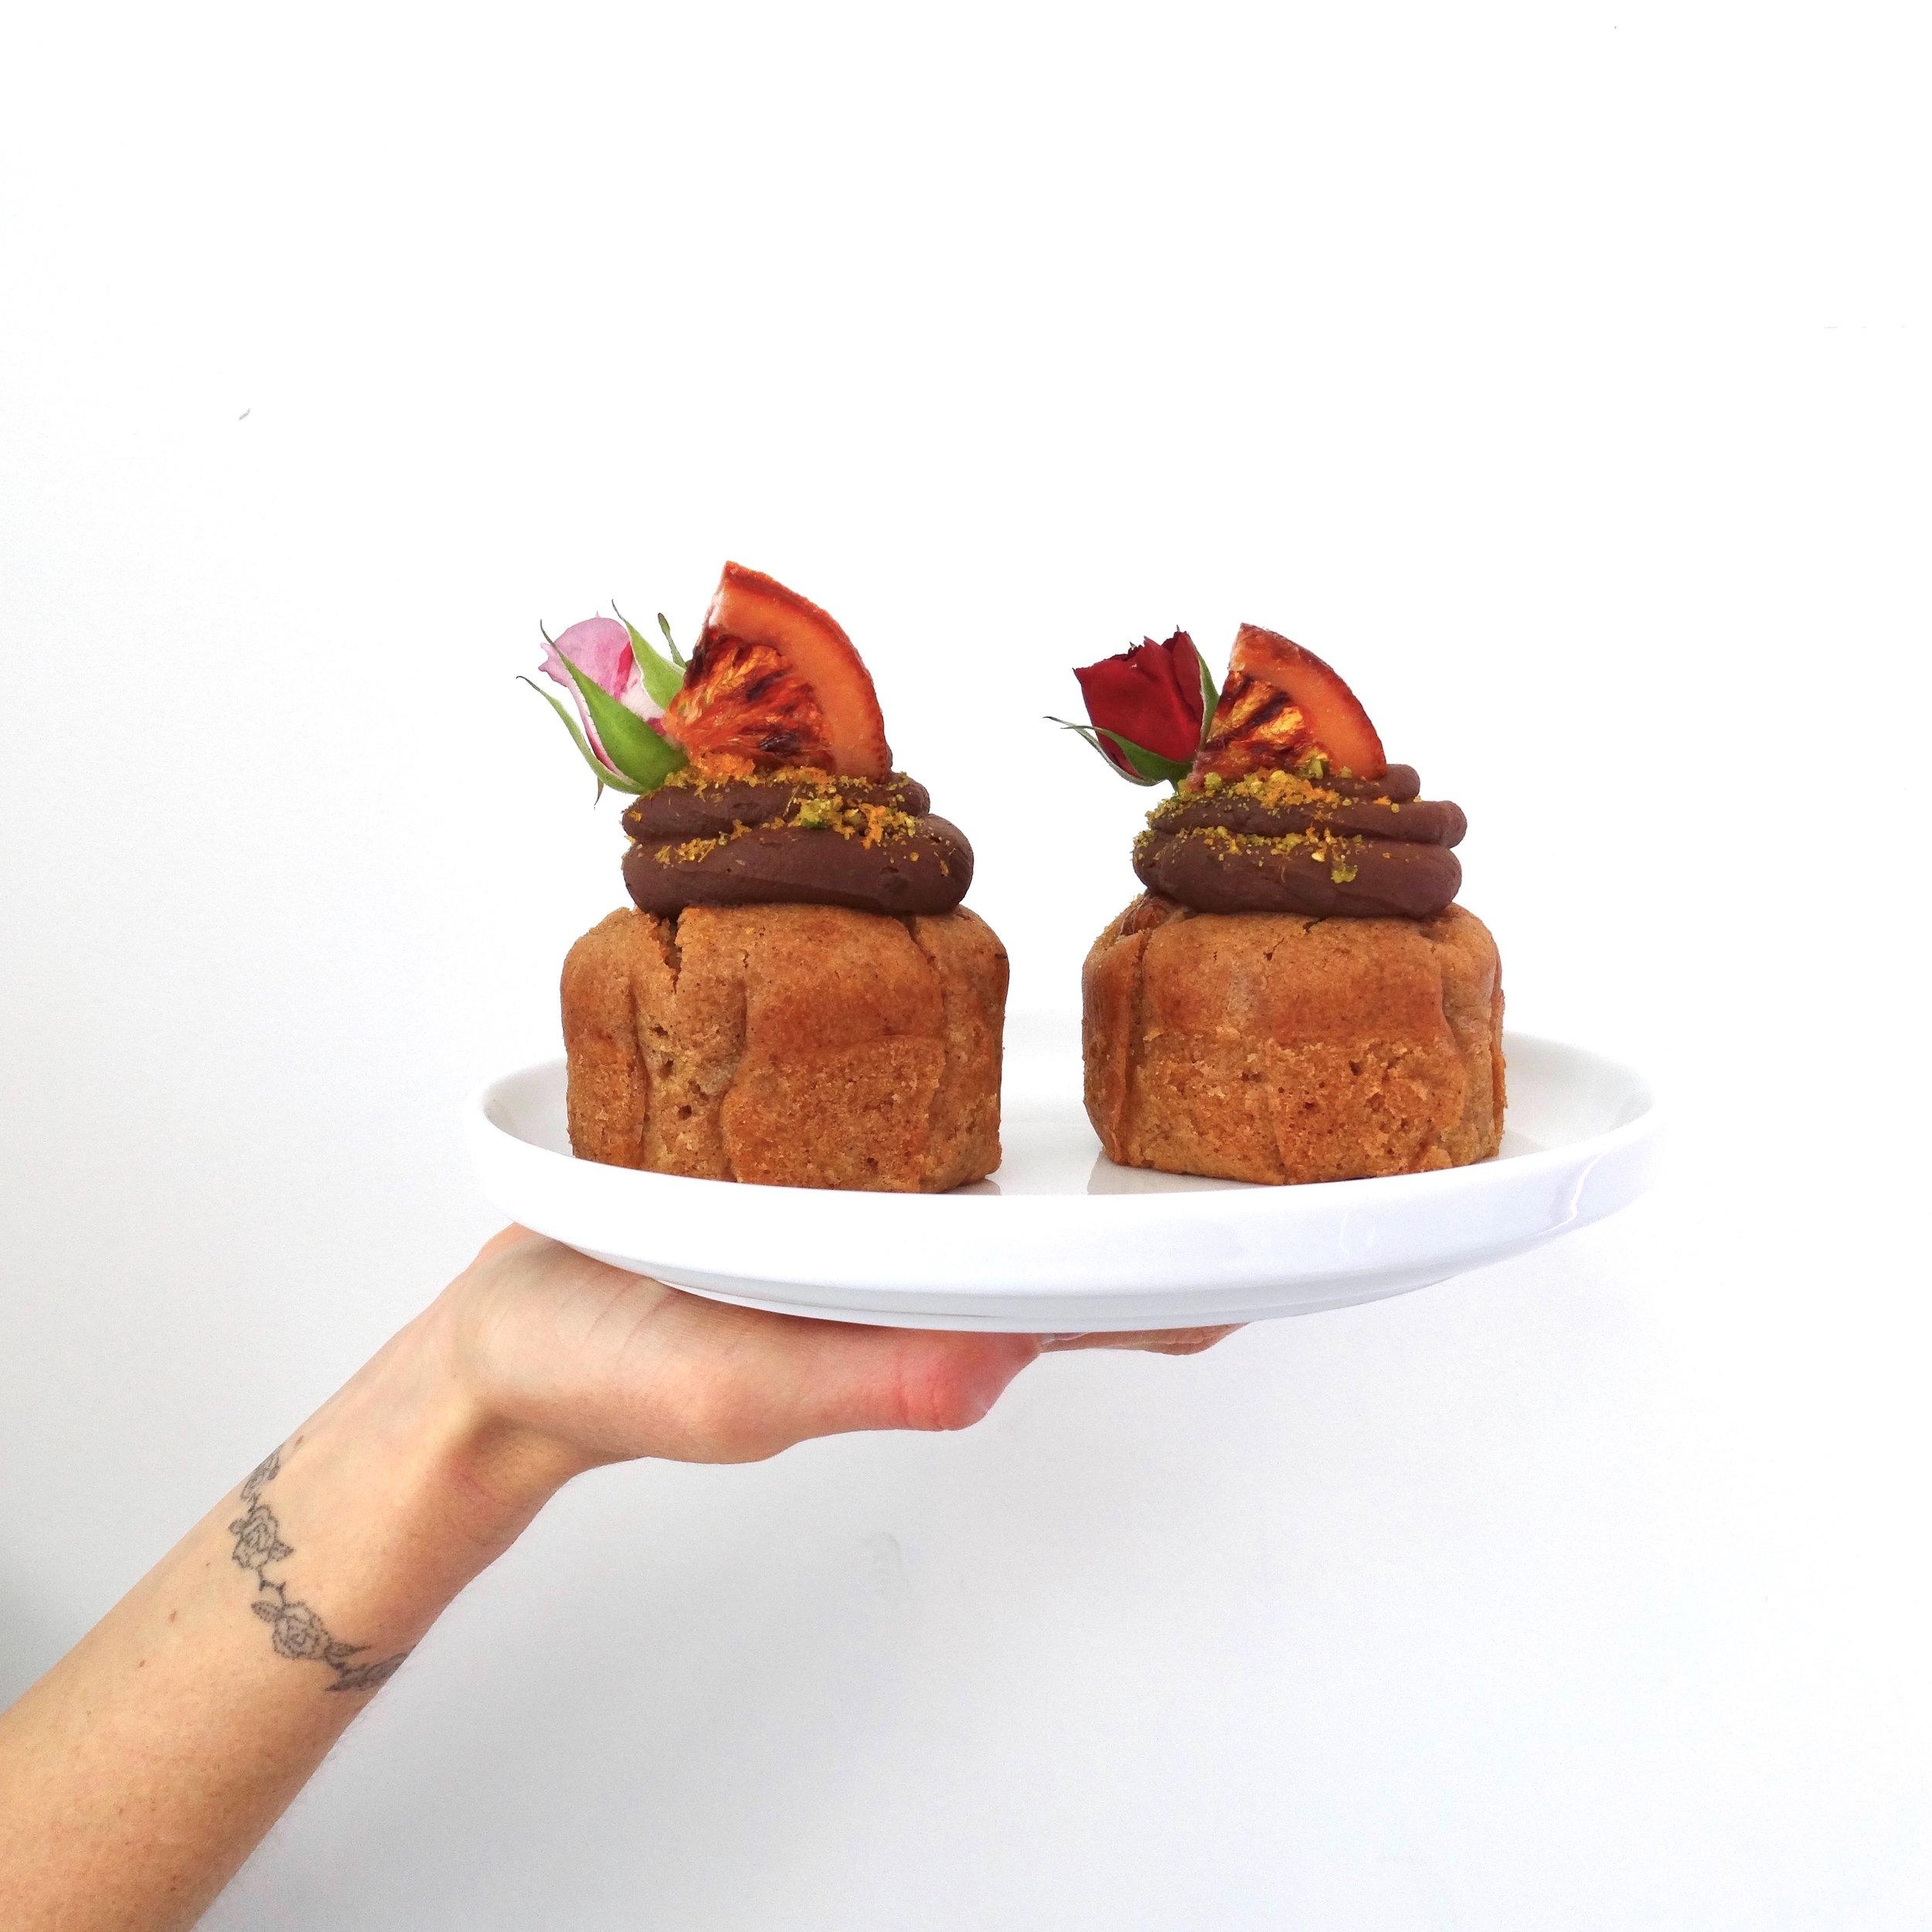 Pana Chocolate The Caker Vegan Cake